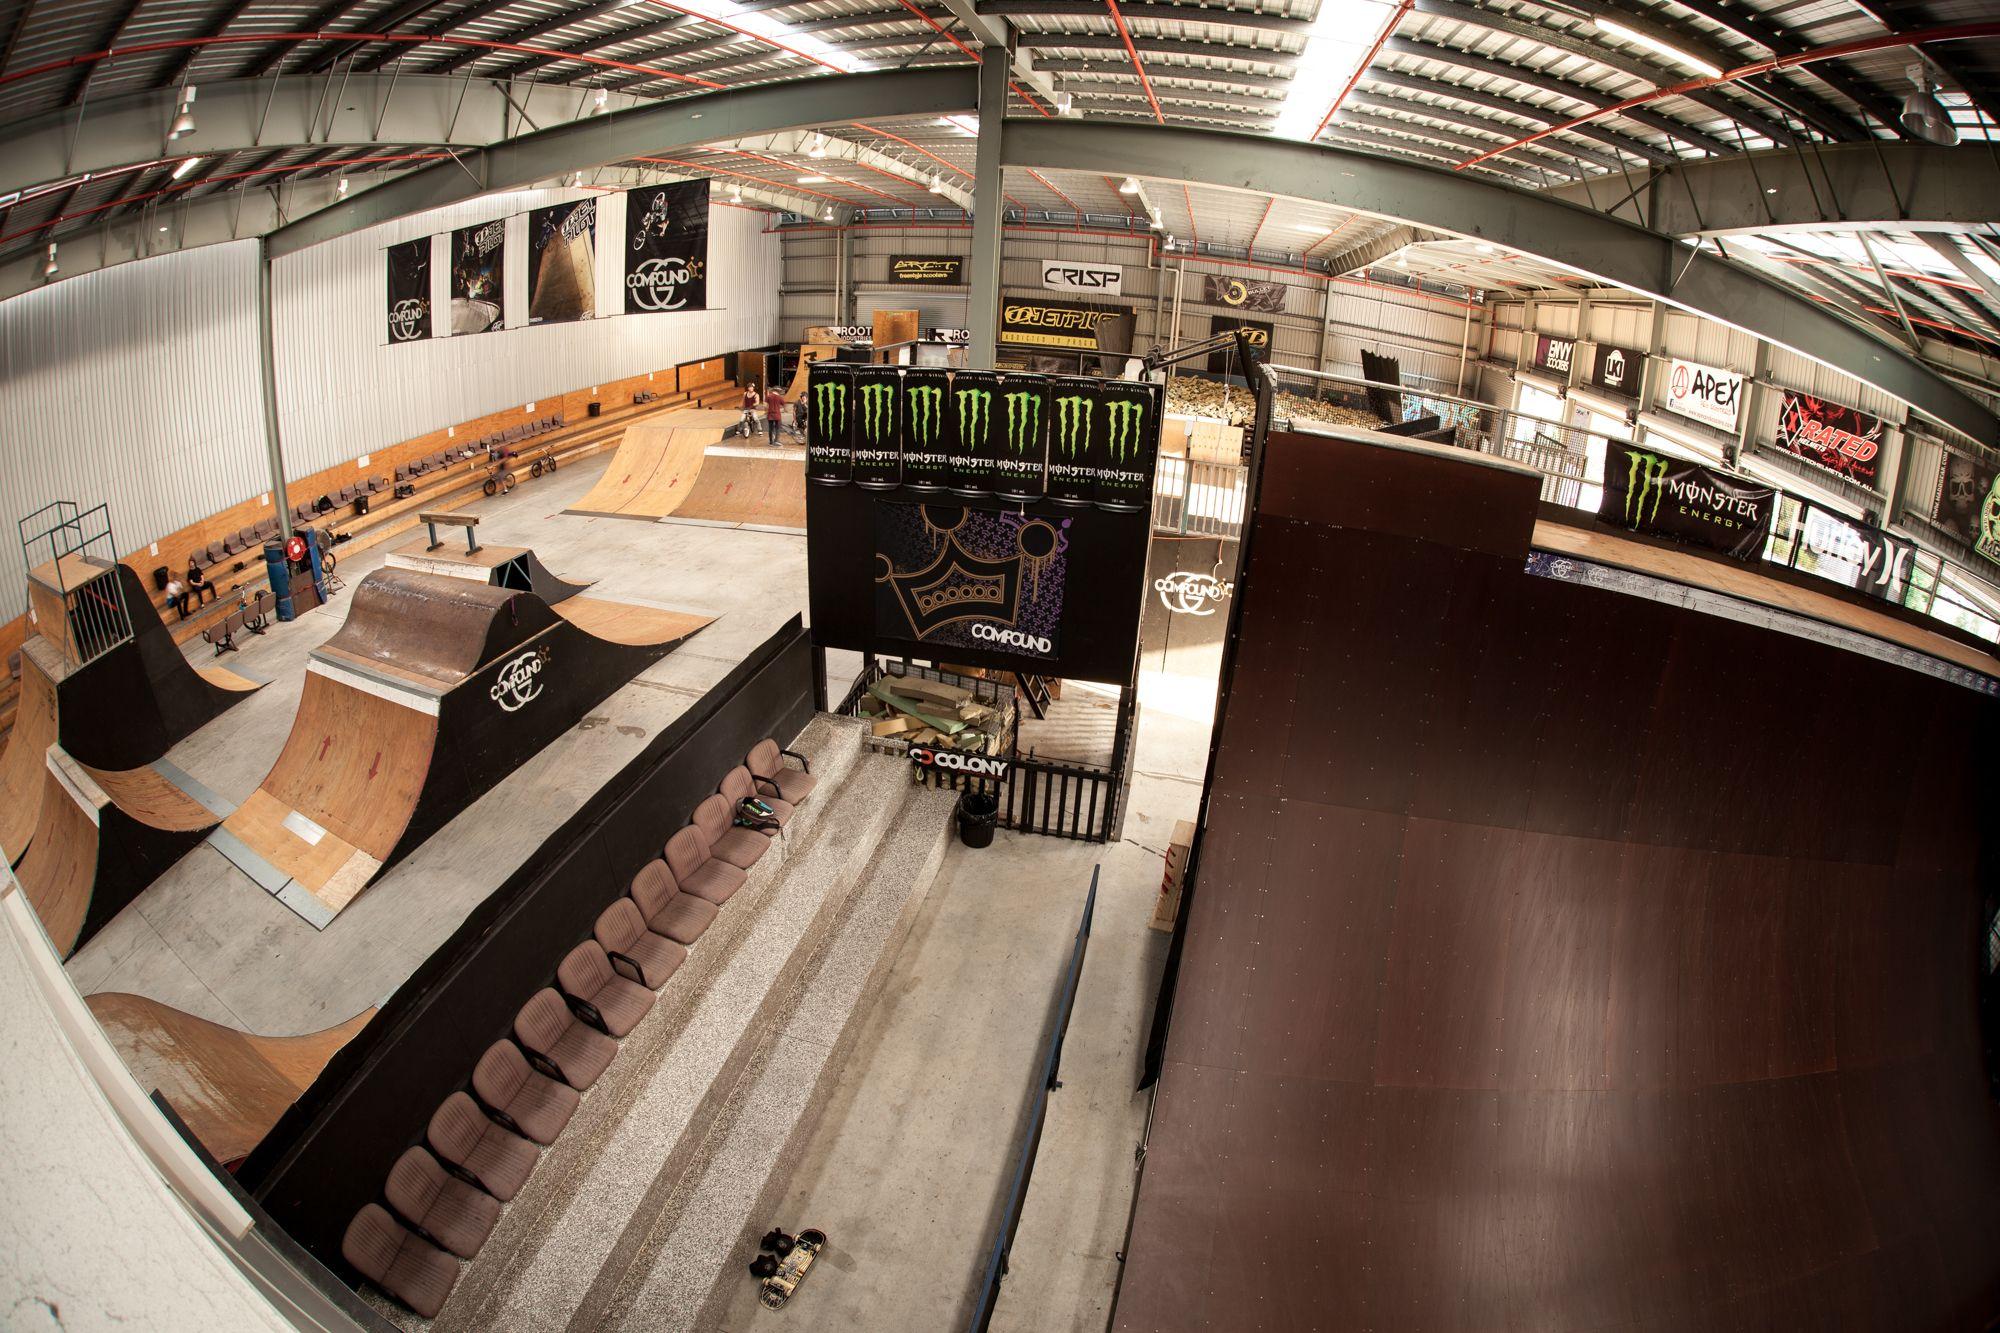 indoor skatepark Google Search Skateboard park, Skate